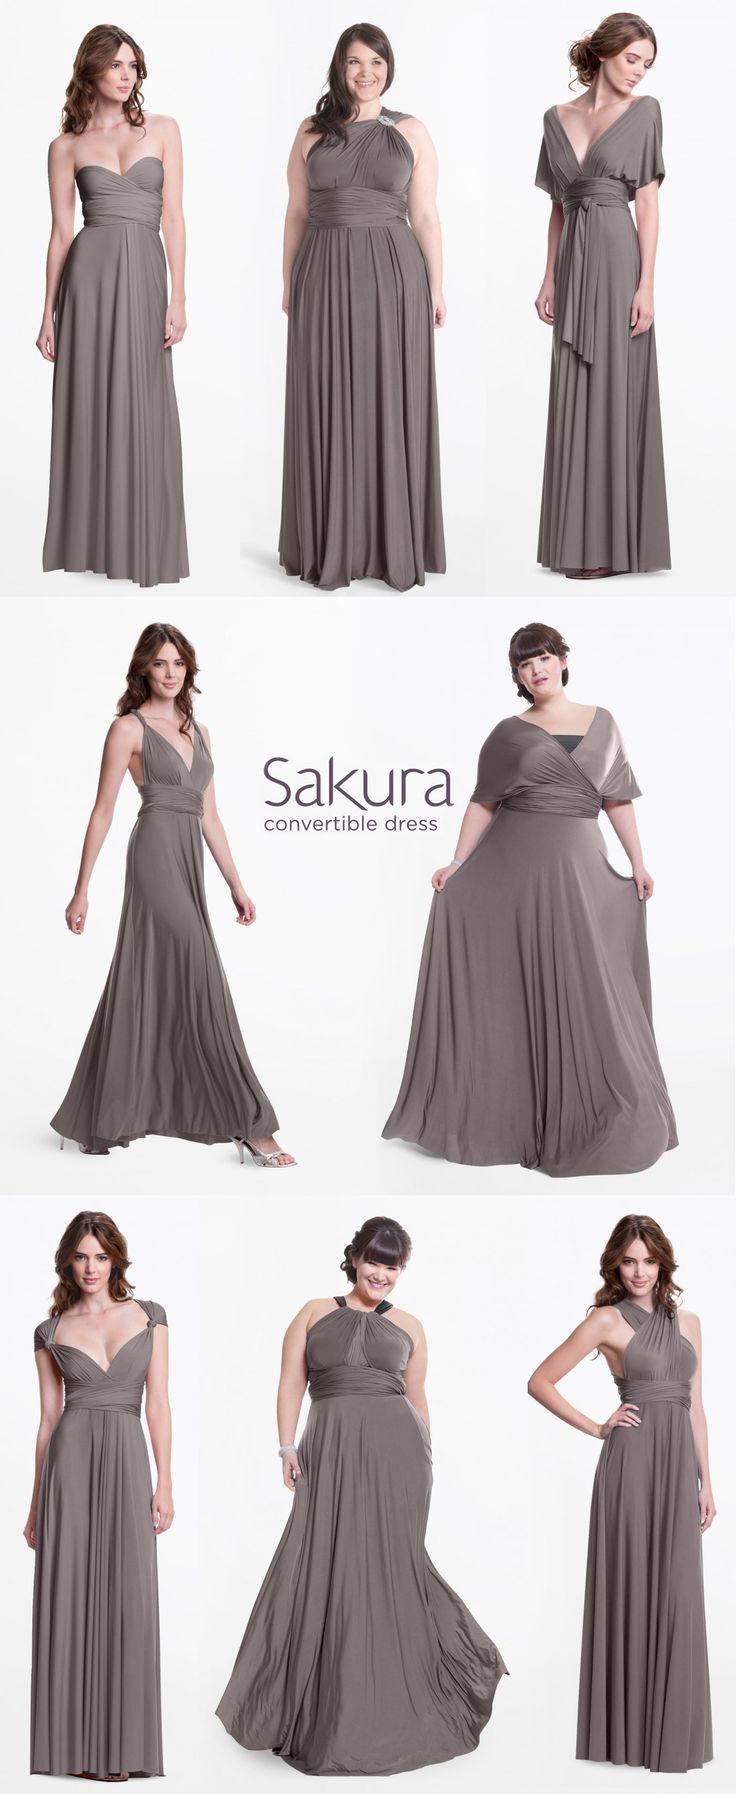 26bab086bc892c9edd311f295b1ed82c.jpg | Infinity dress | Pinterest ...